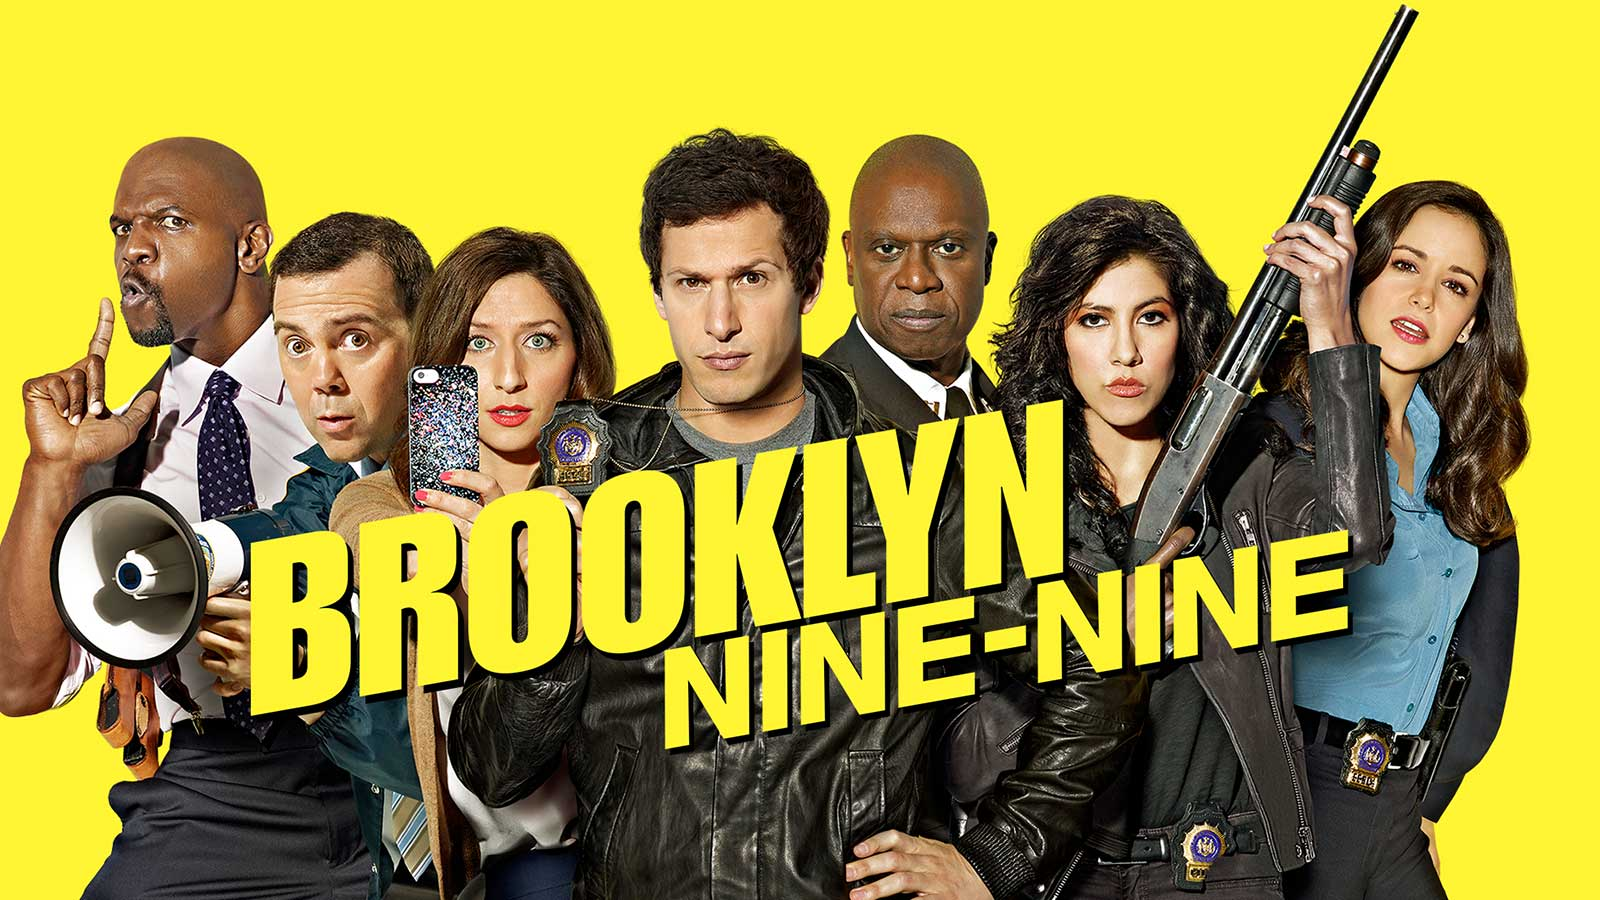 Brooklyn Nine-Nine Cast Talks About Their Sixth Season